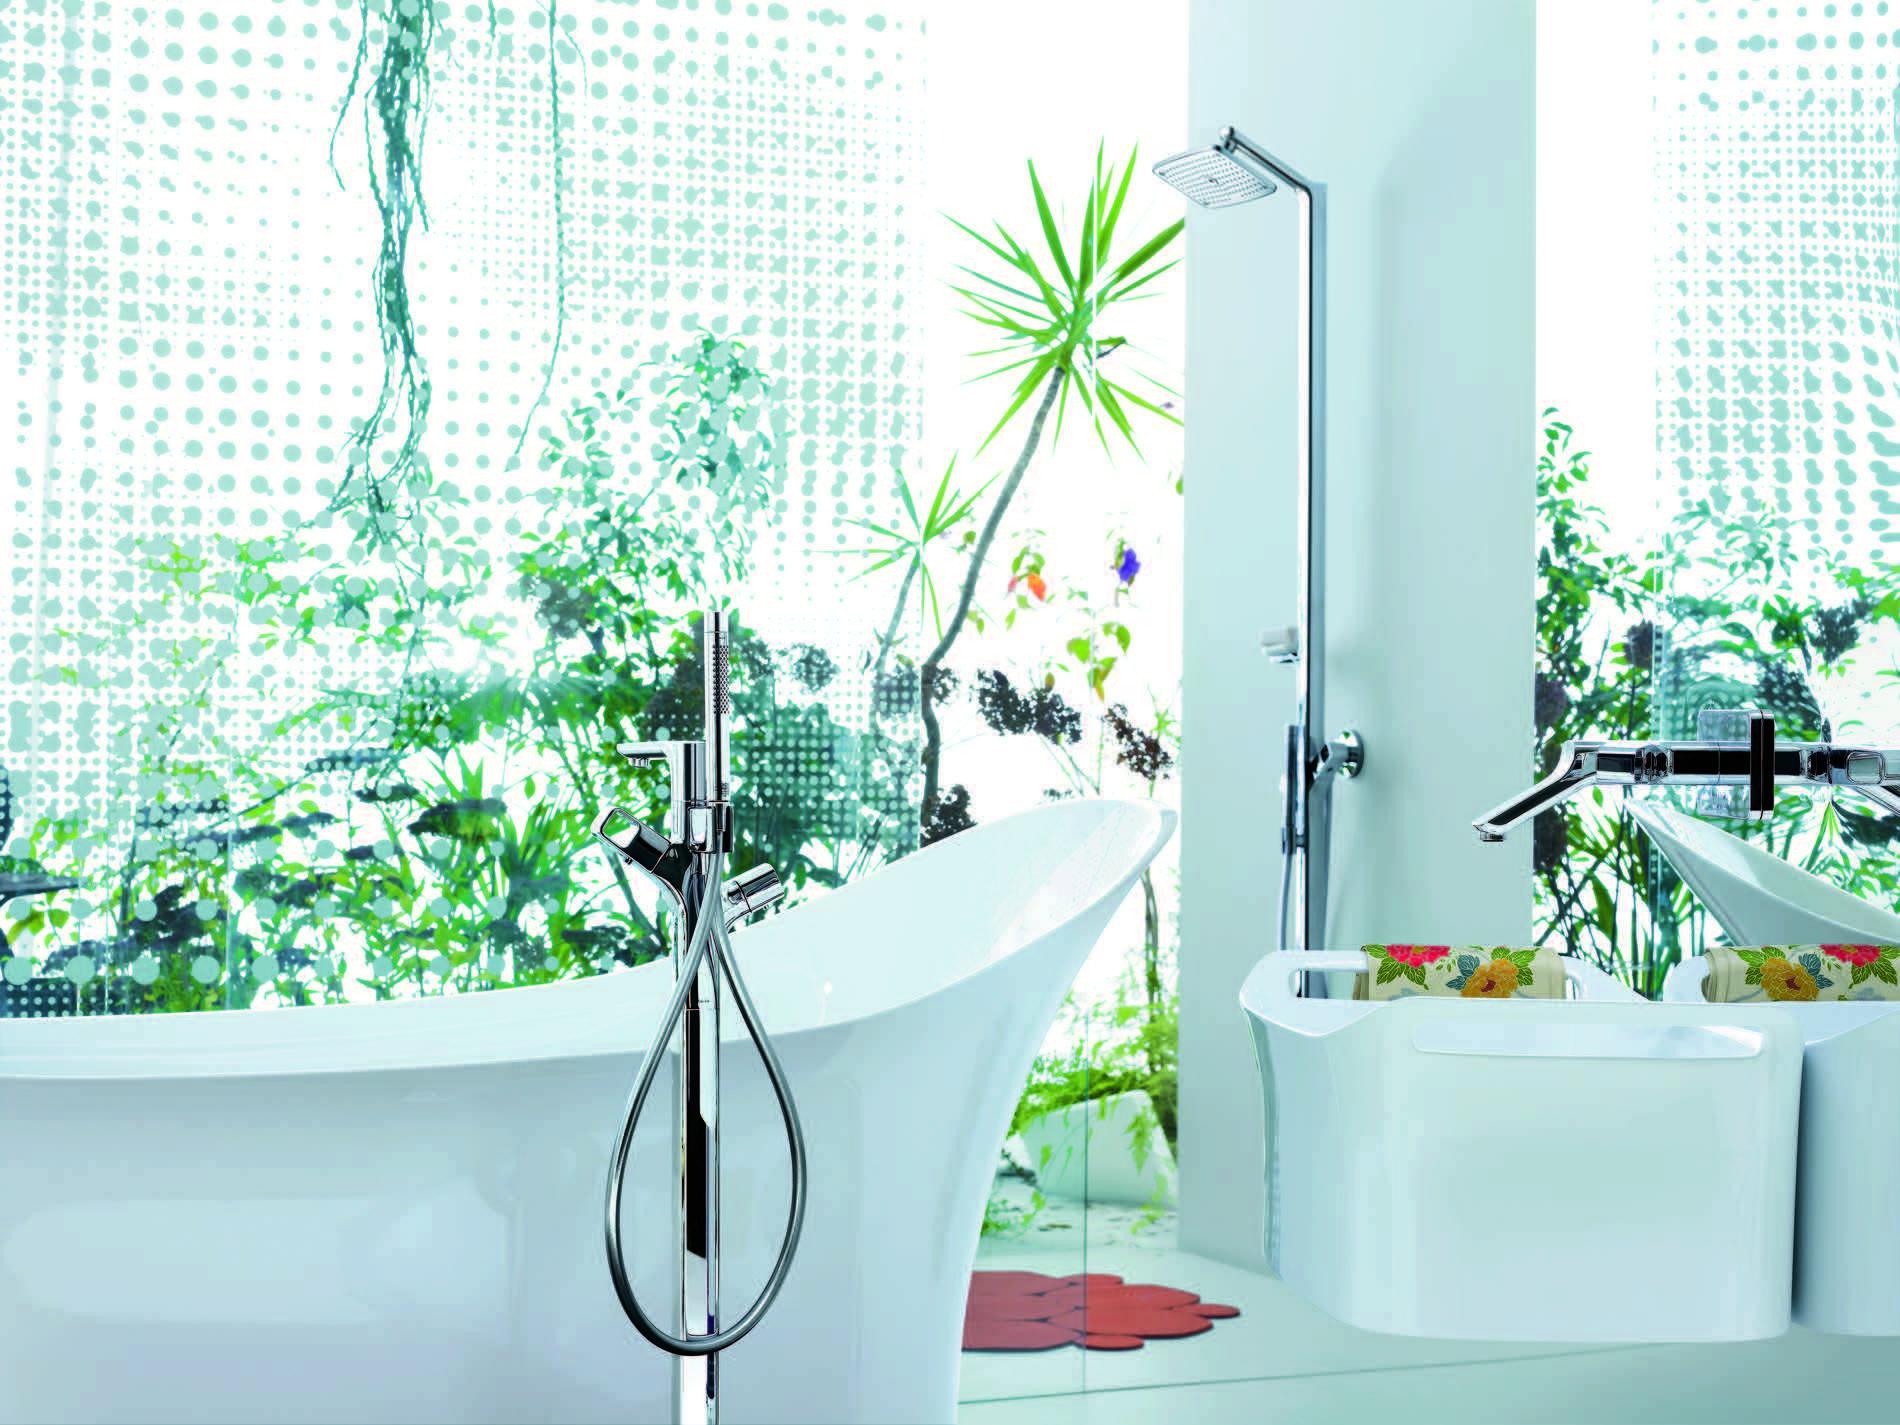 Axor Urquiola Tub with Freestanding Tub Filler | Detailed - Feminine ...